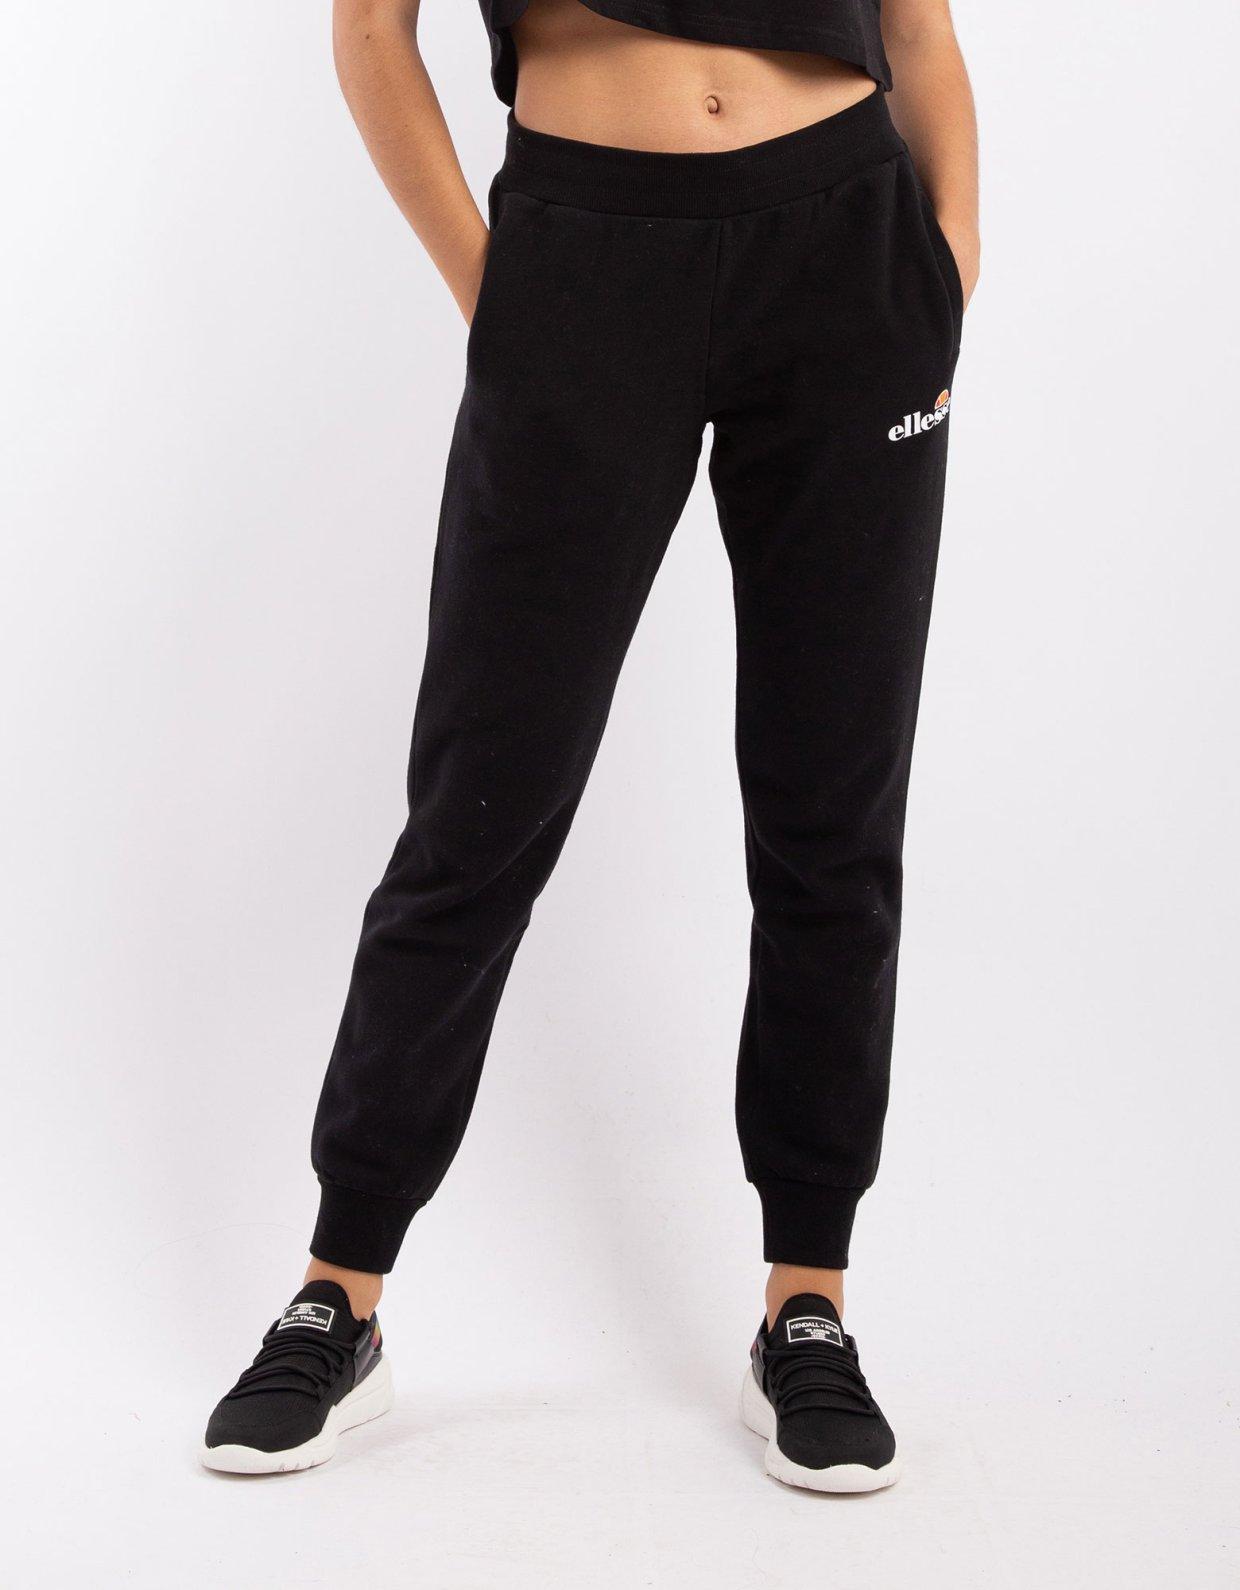 Ellesse Hallouli jog pants black